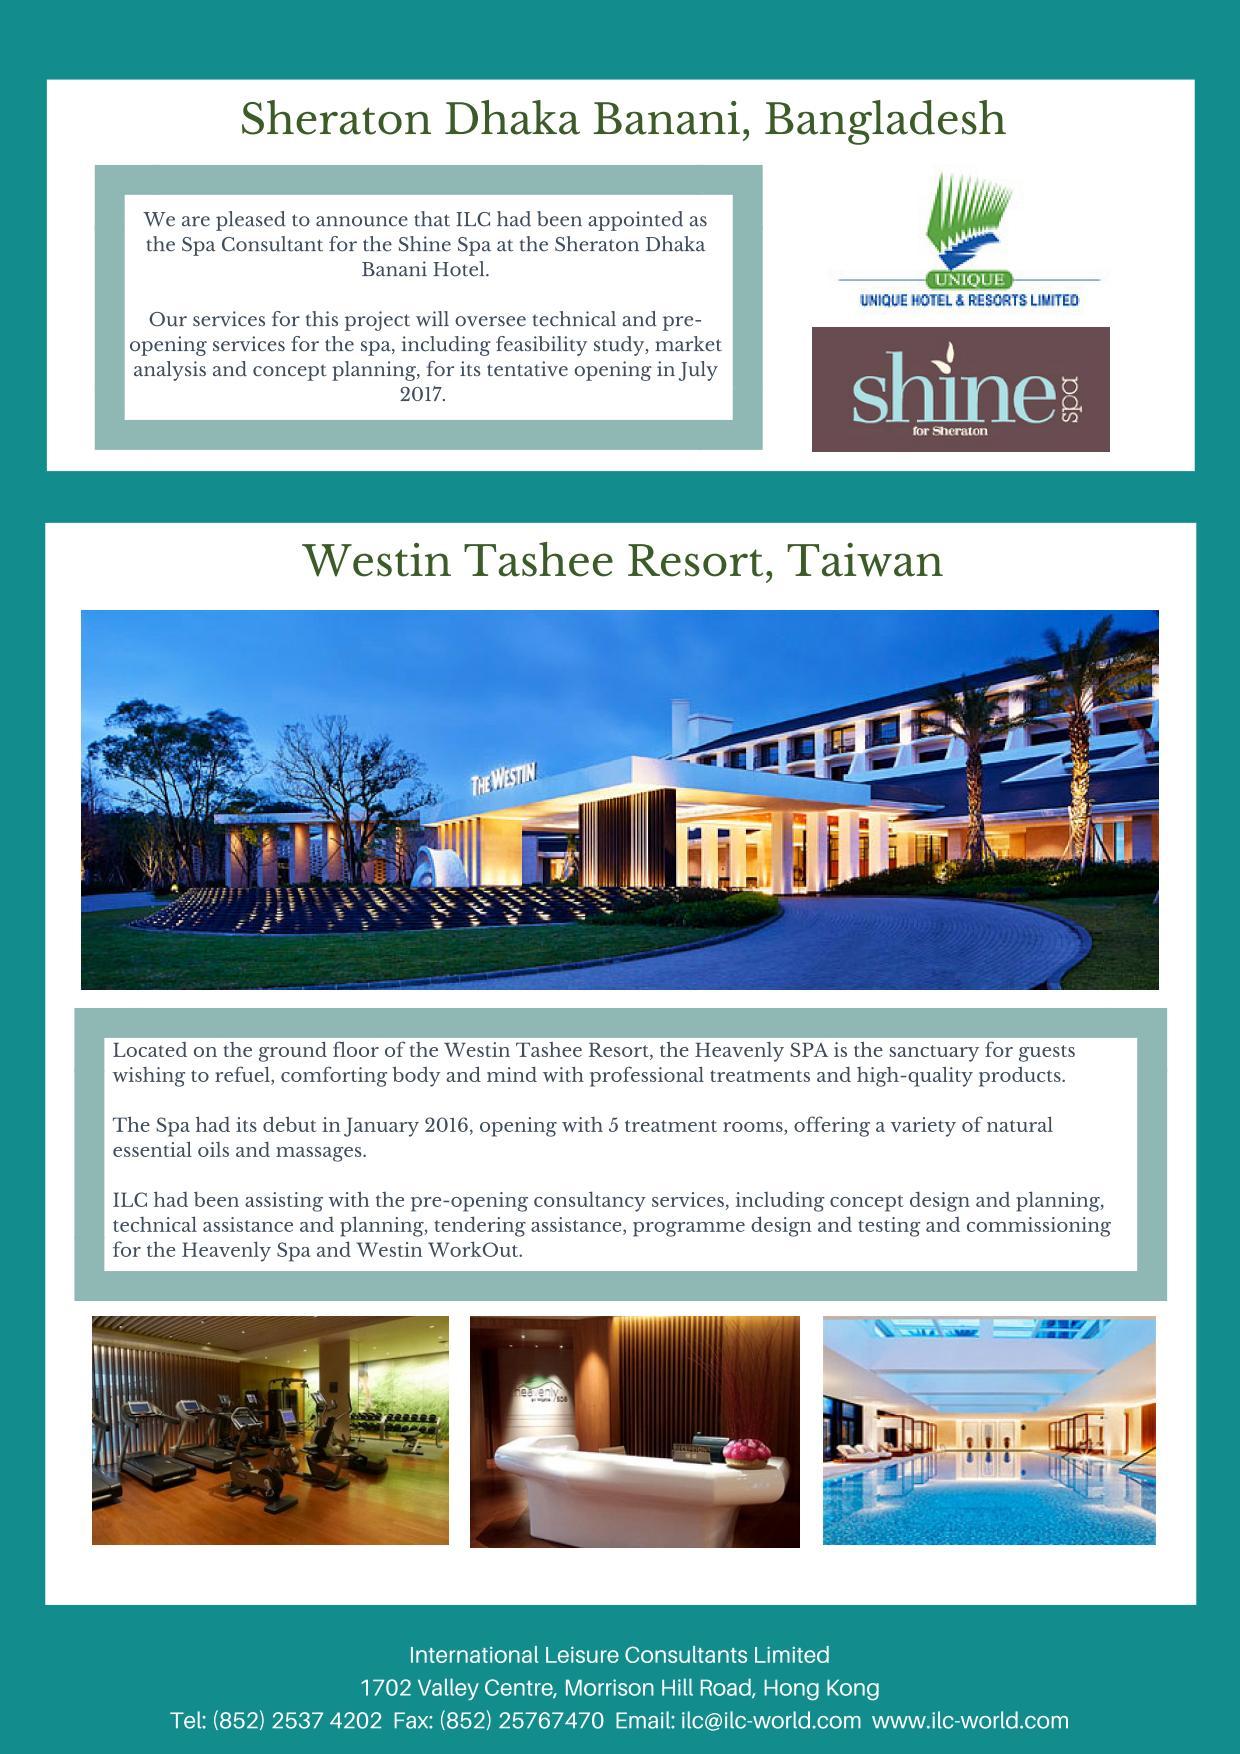 Newsletter – International Leisure Consultants Ltd